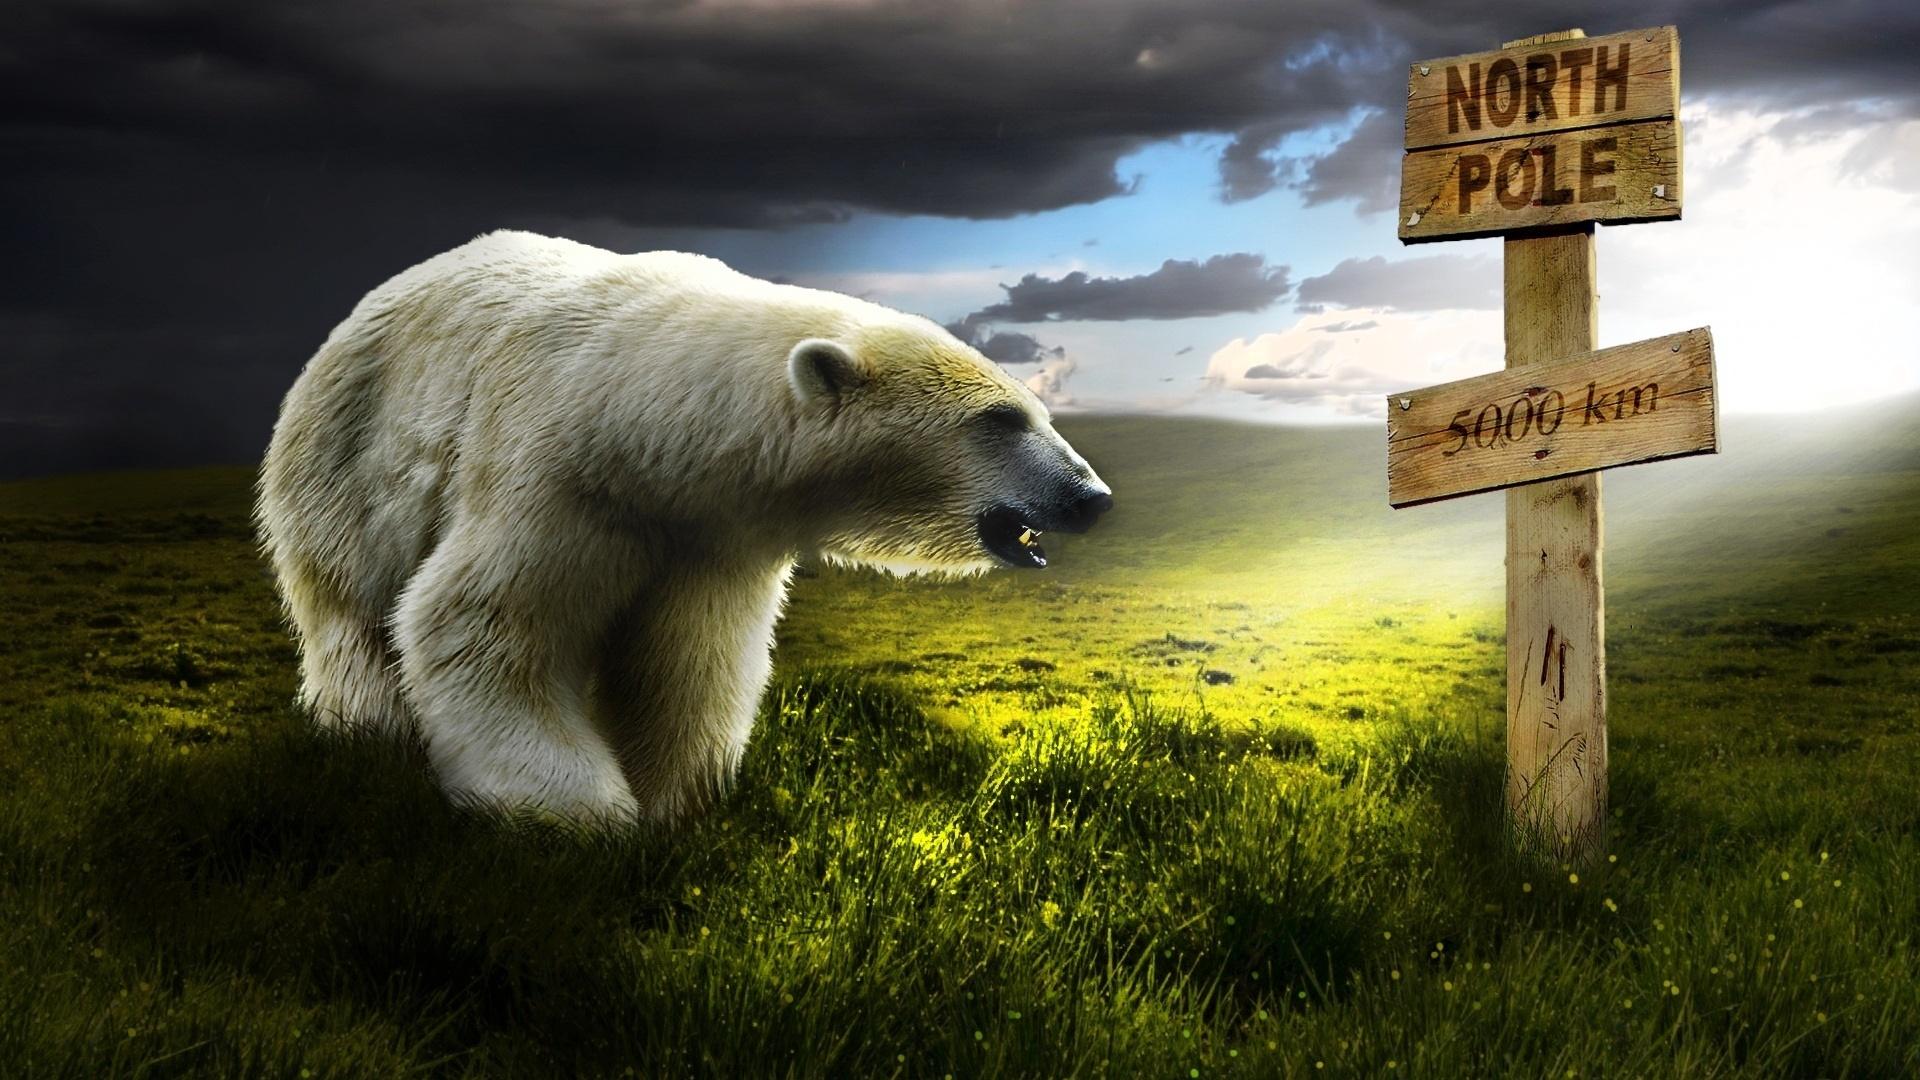 Far from North Pole wallpaper